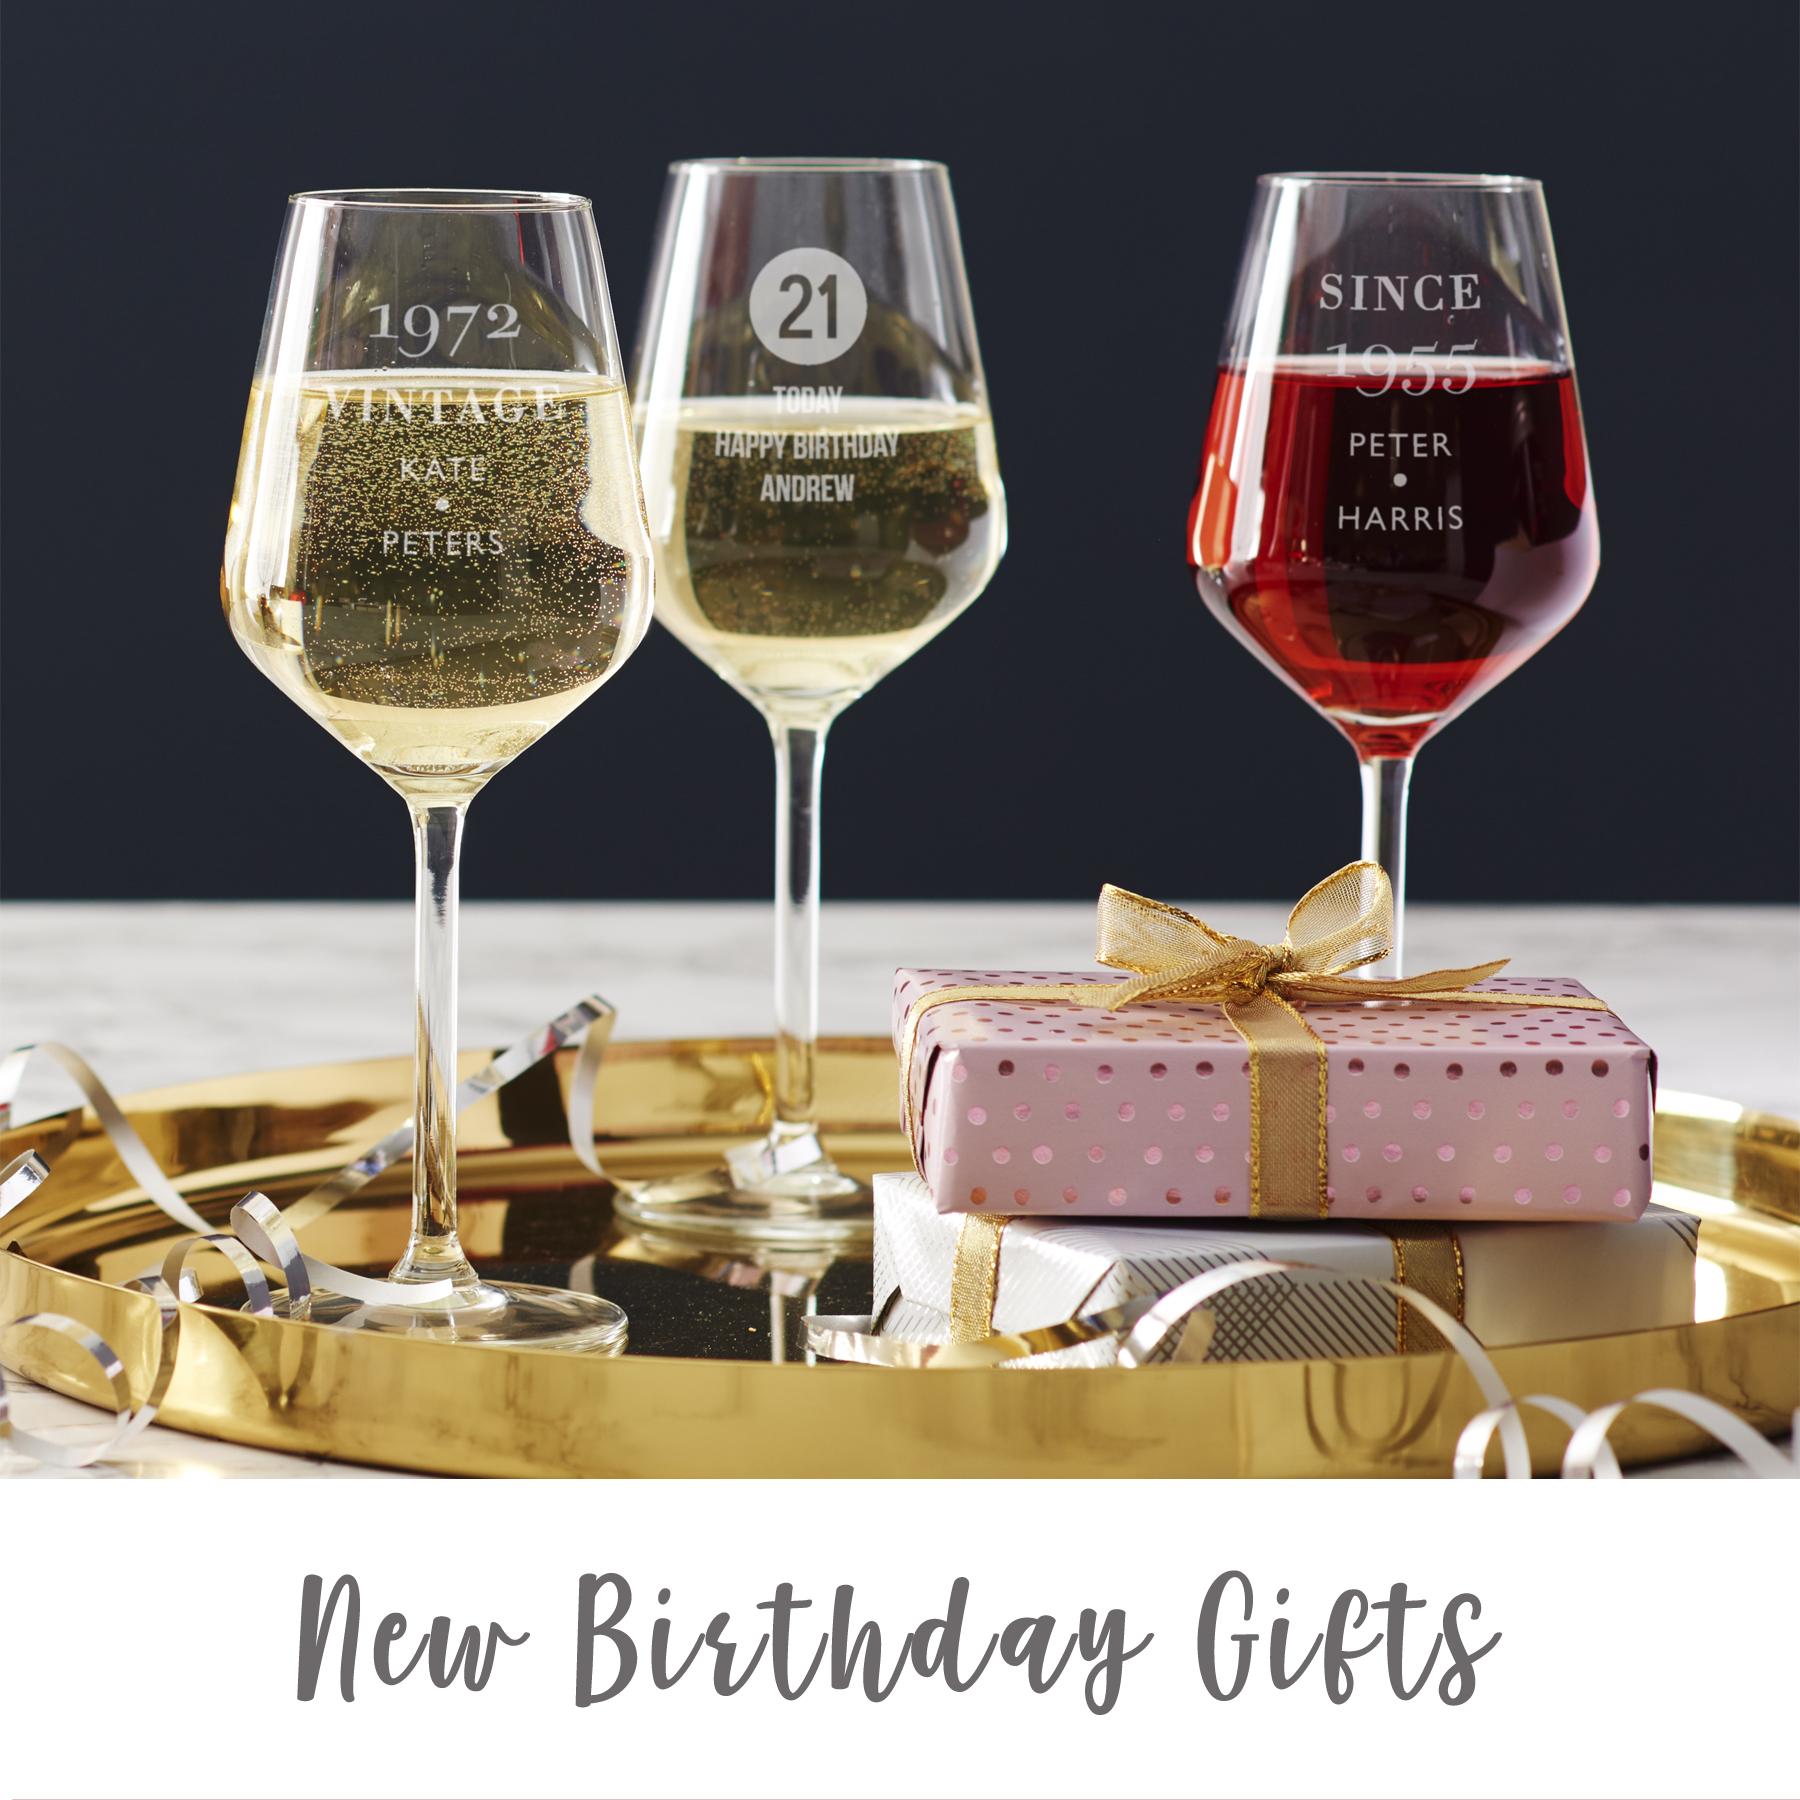 New Birthday Gifts